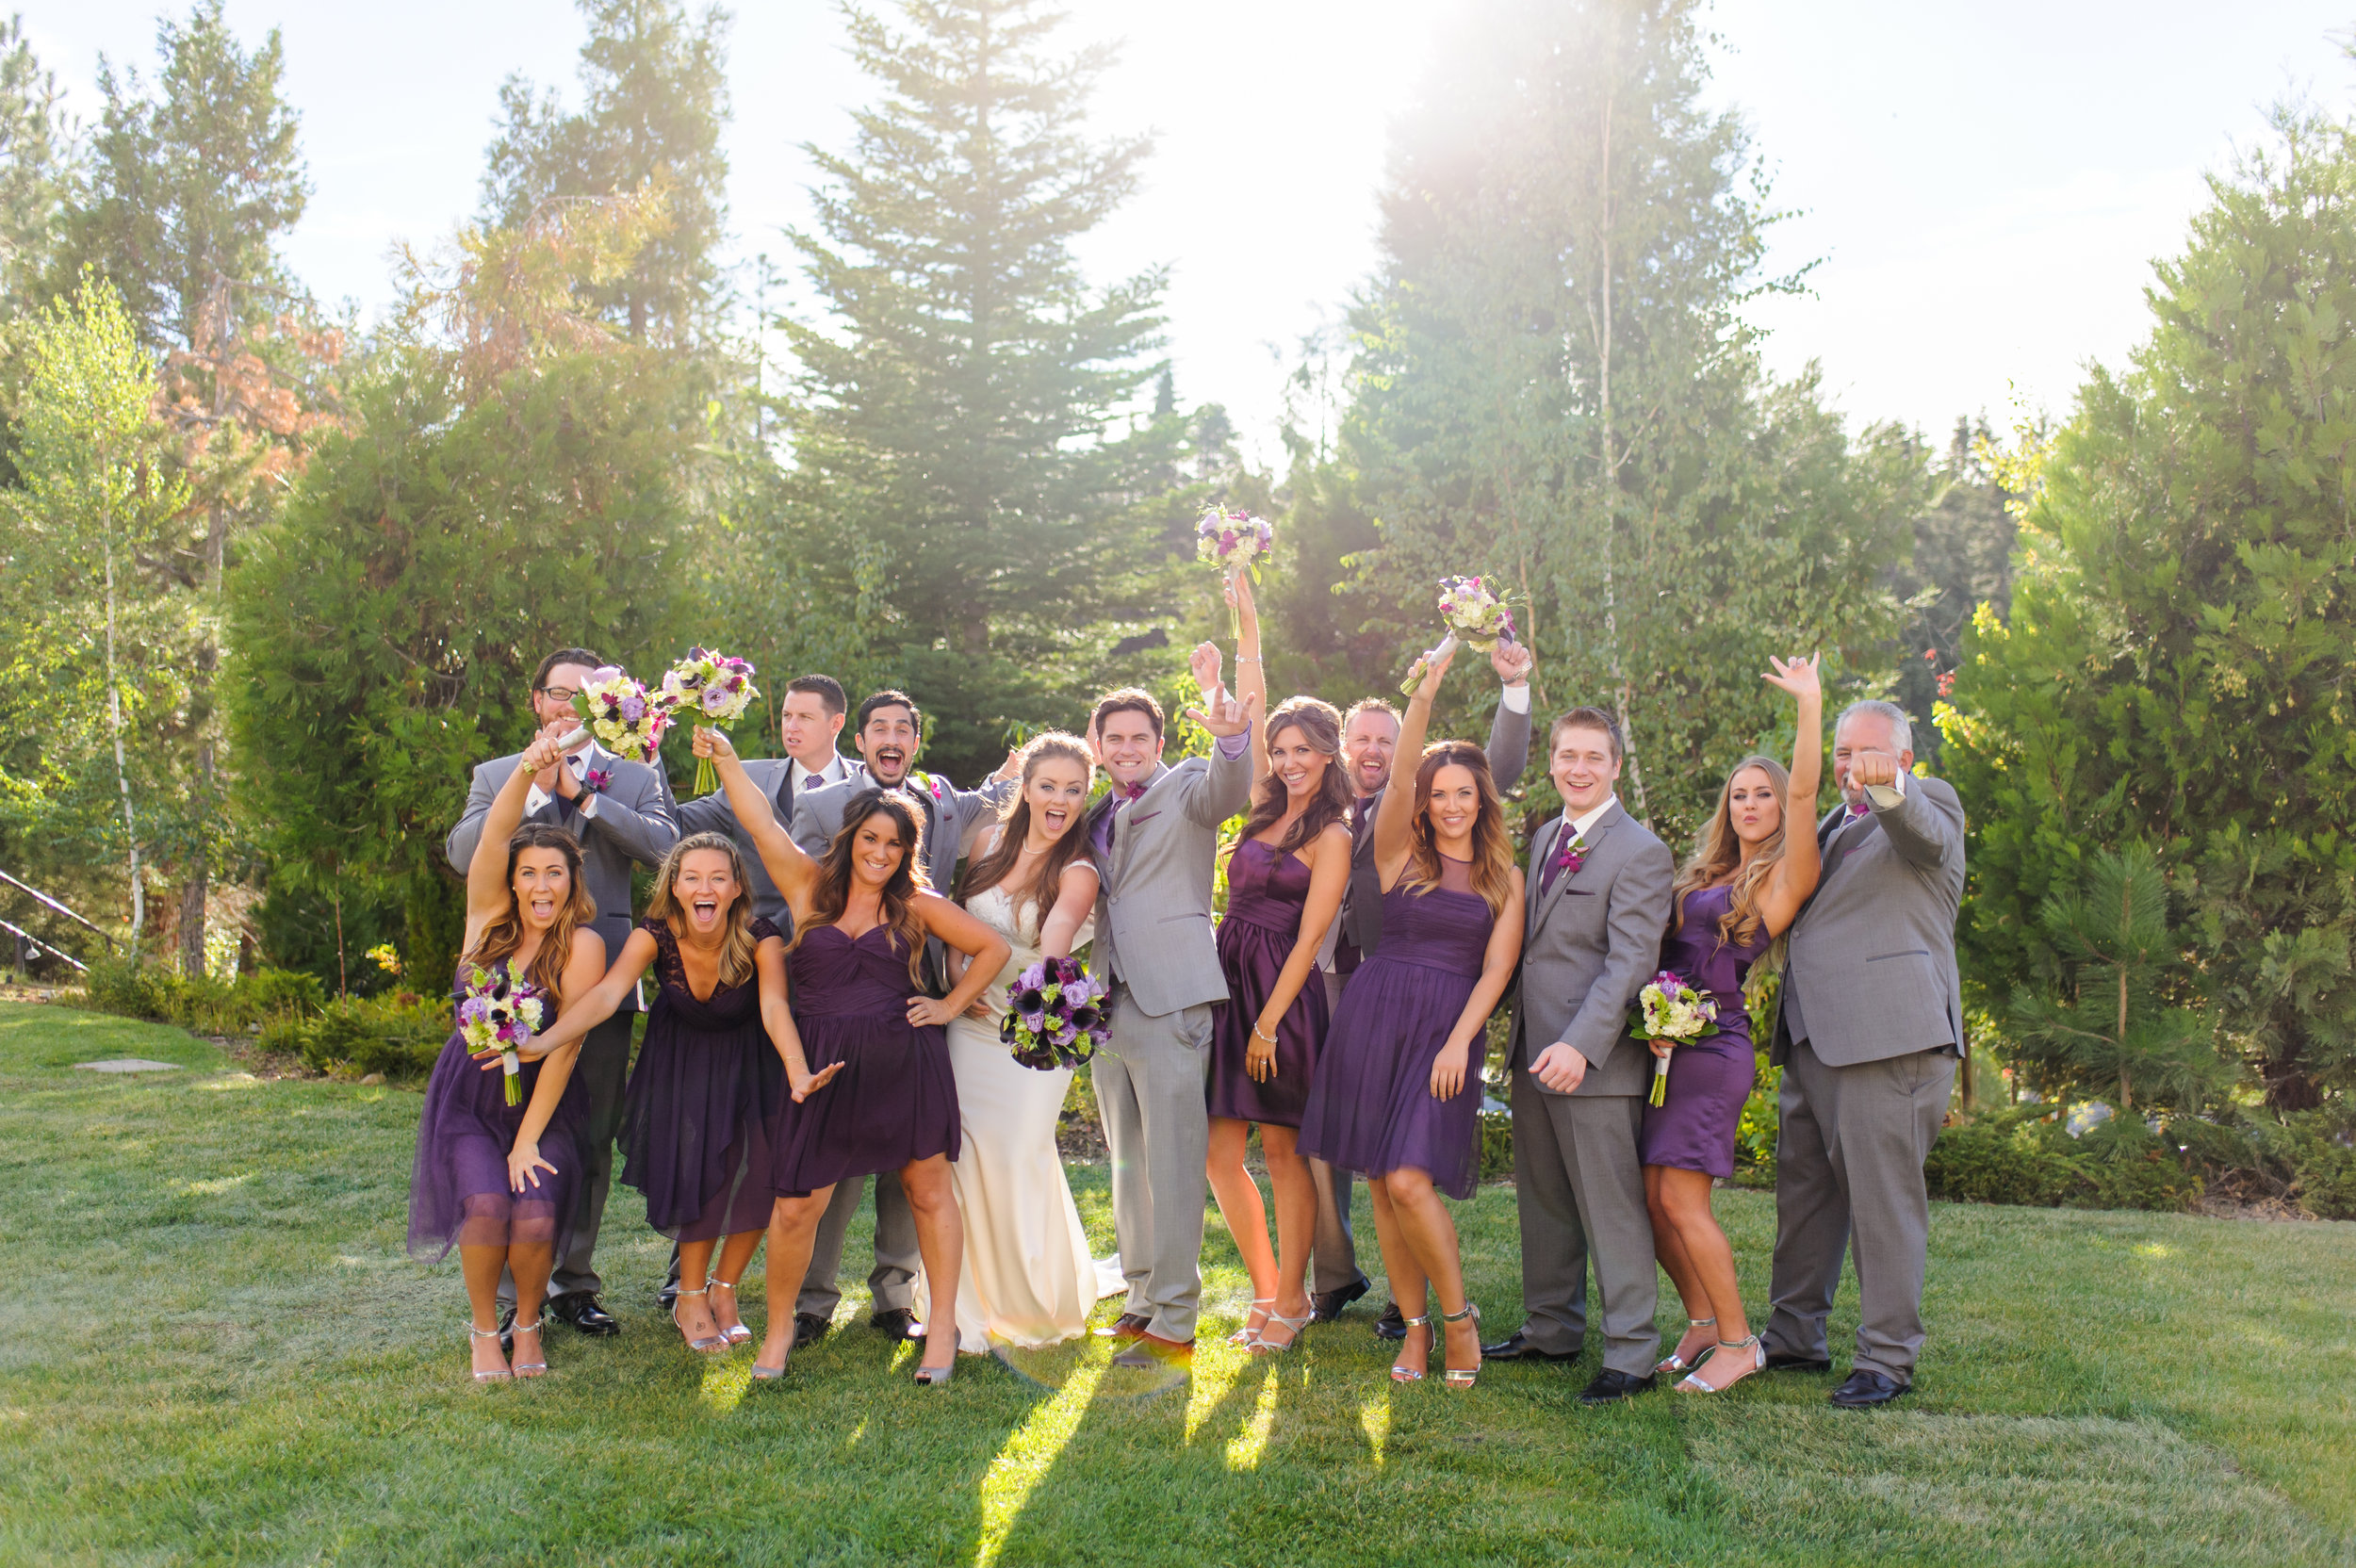 becca-jacob-022-tenaya-lodge-yosemite-wedding-photographer-katherine-nicole-photography.JPG